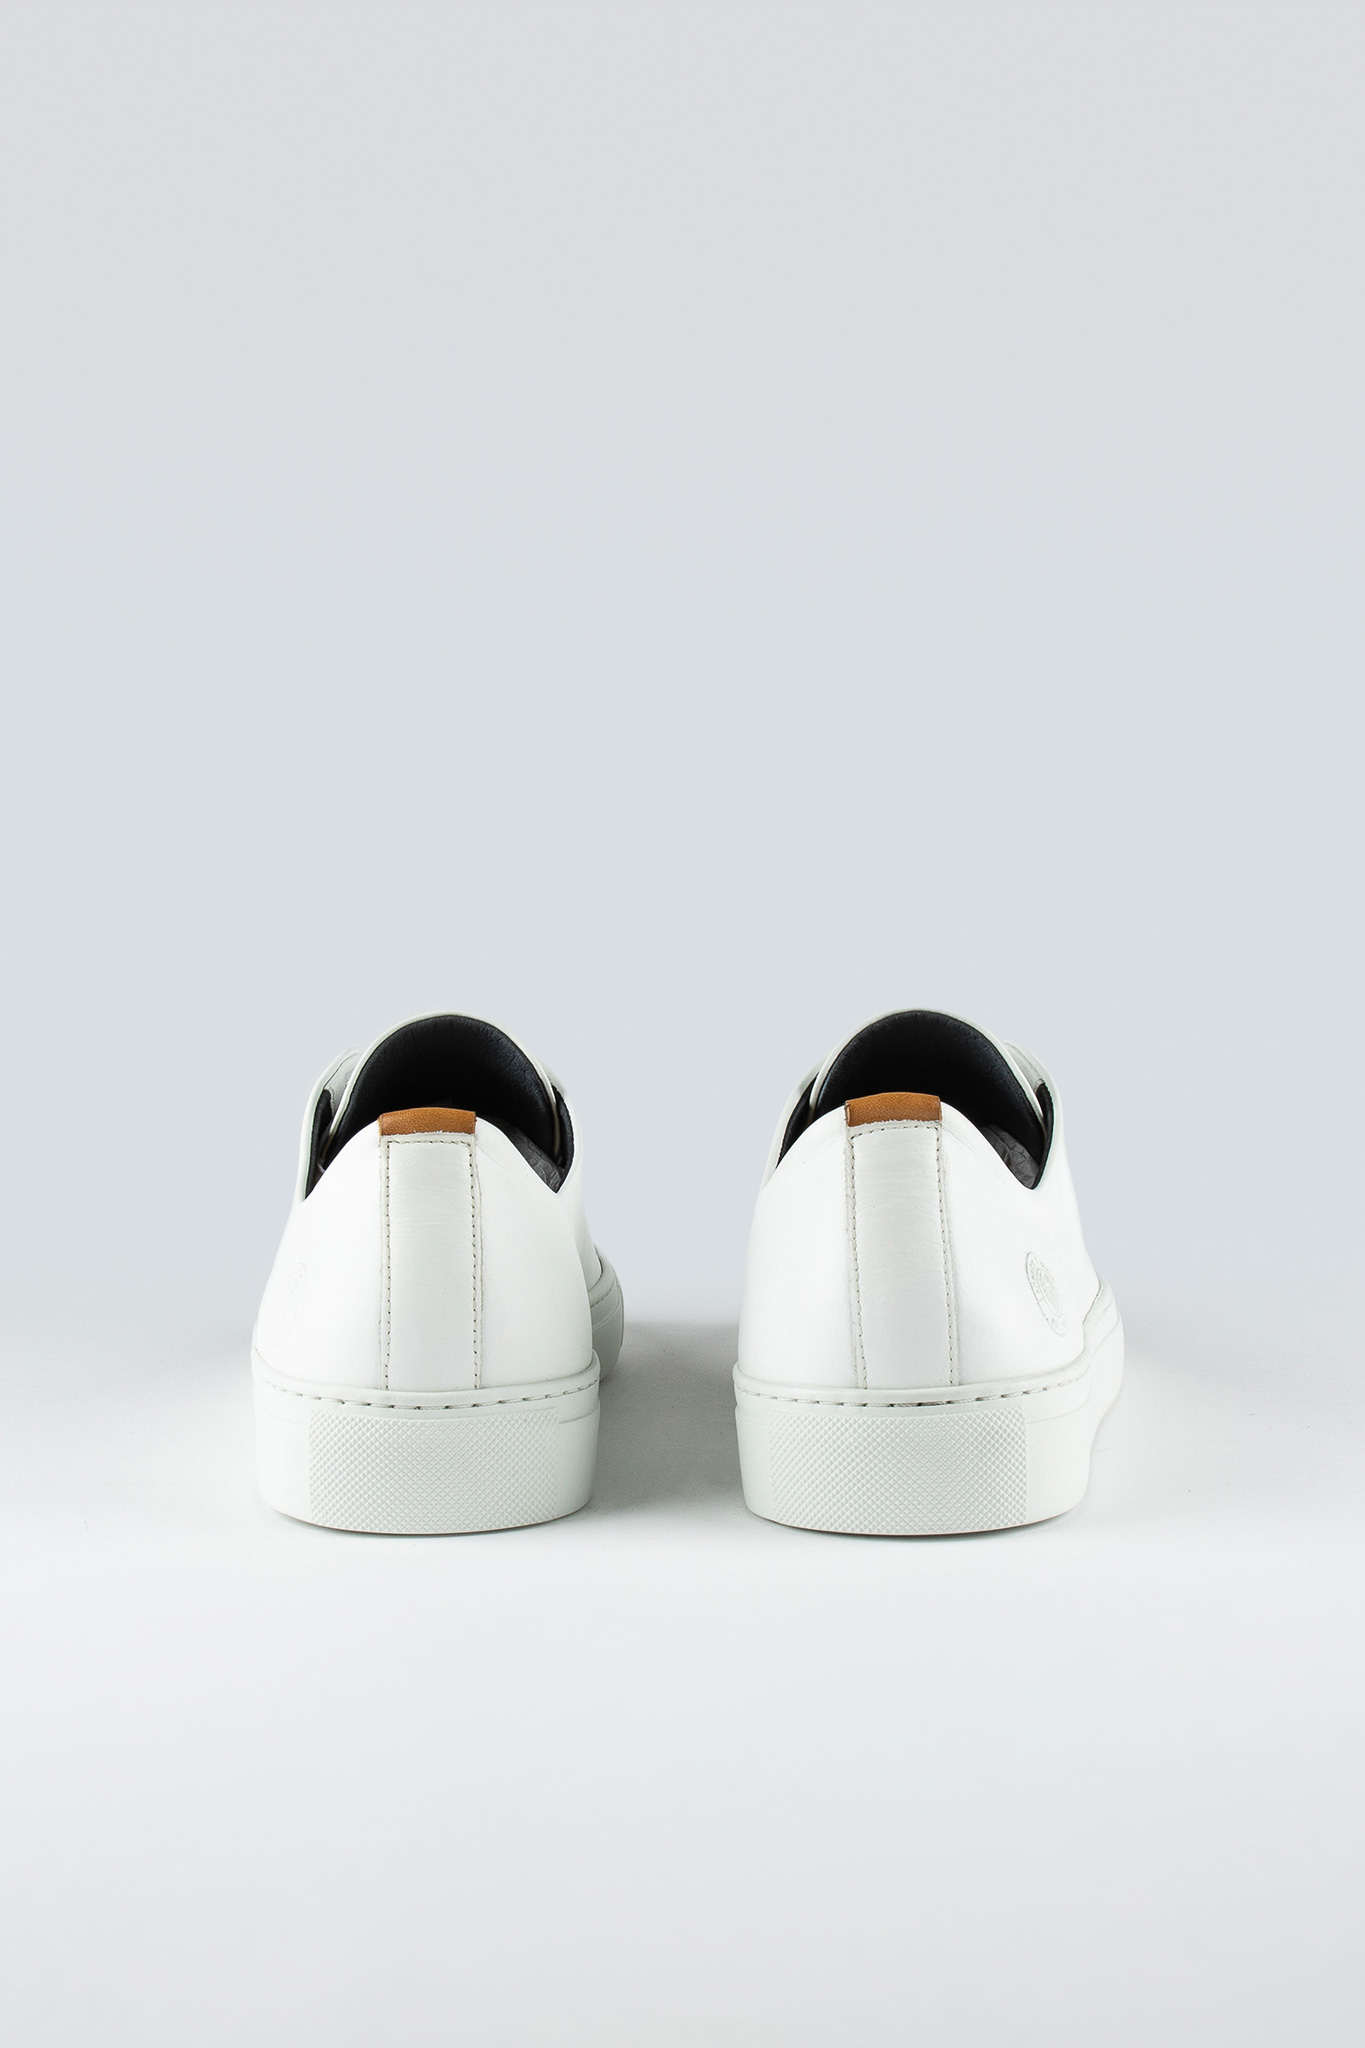 Less White